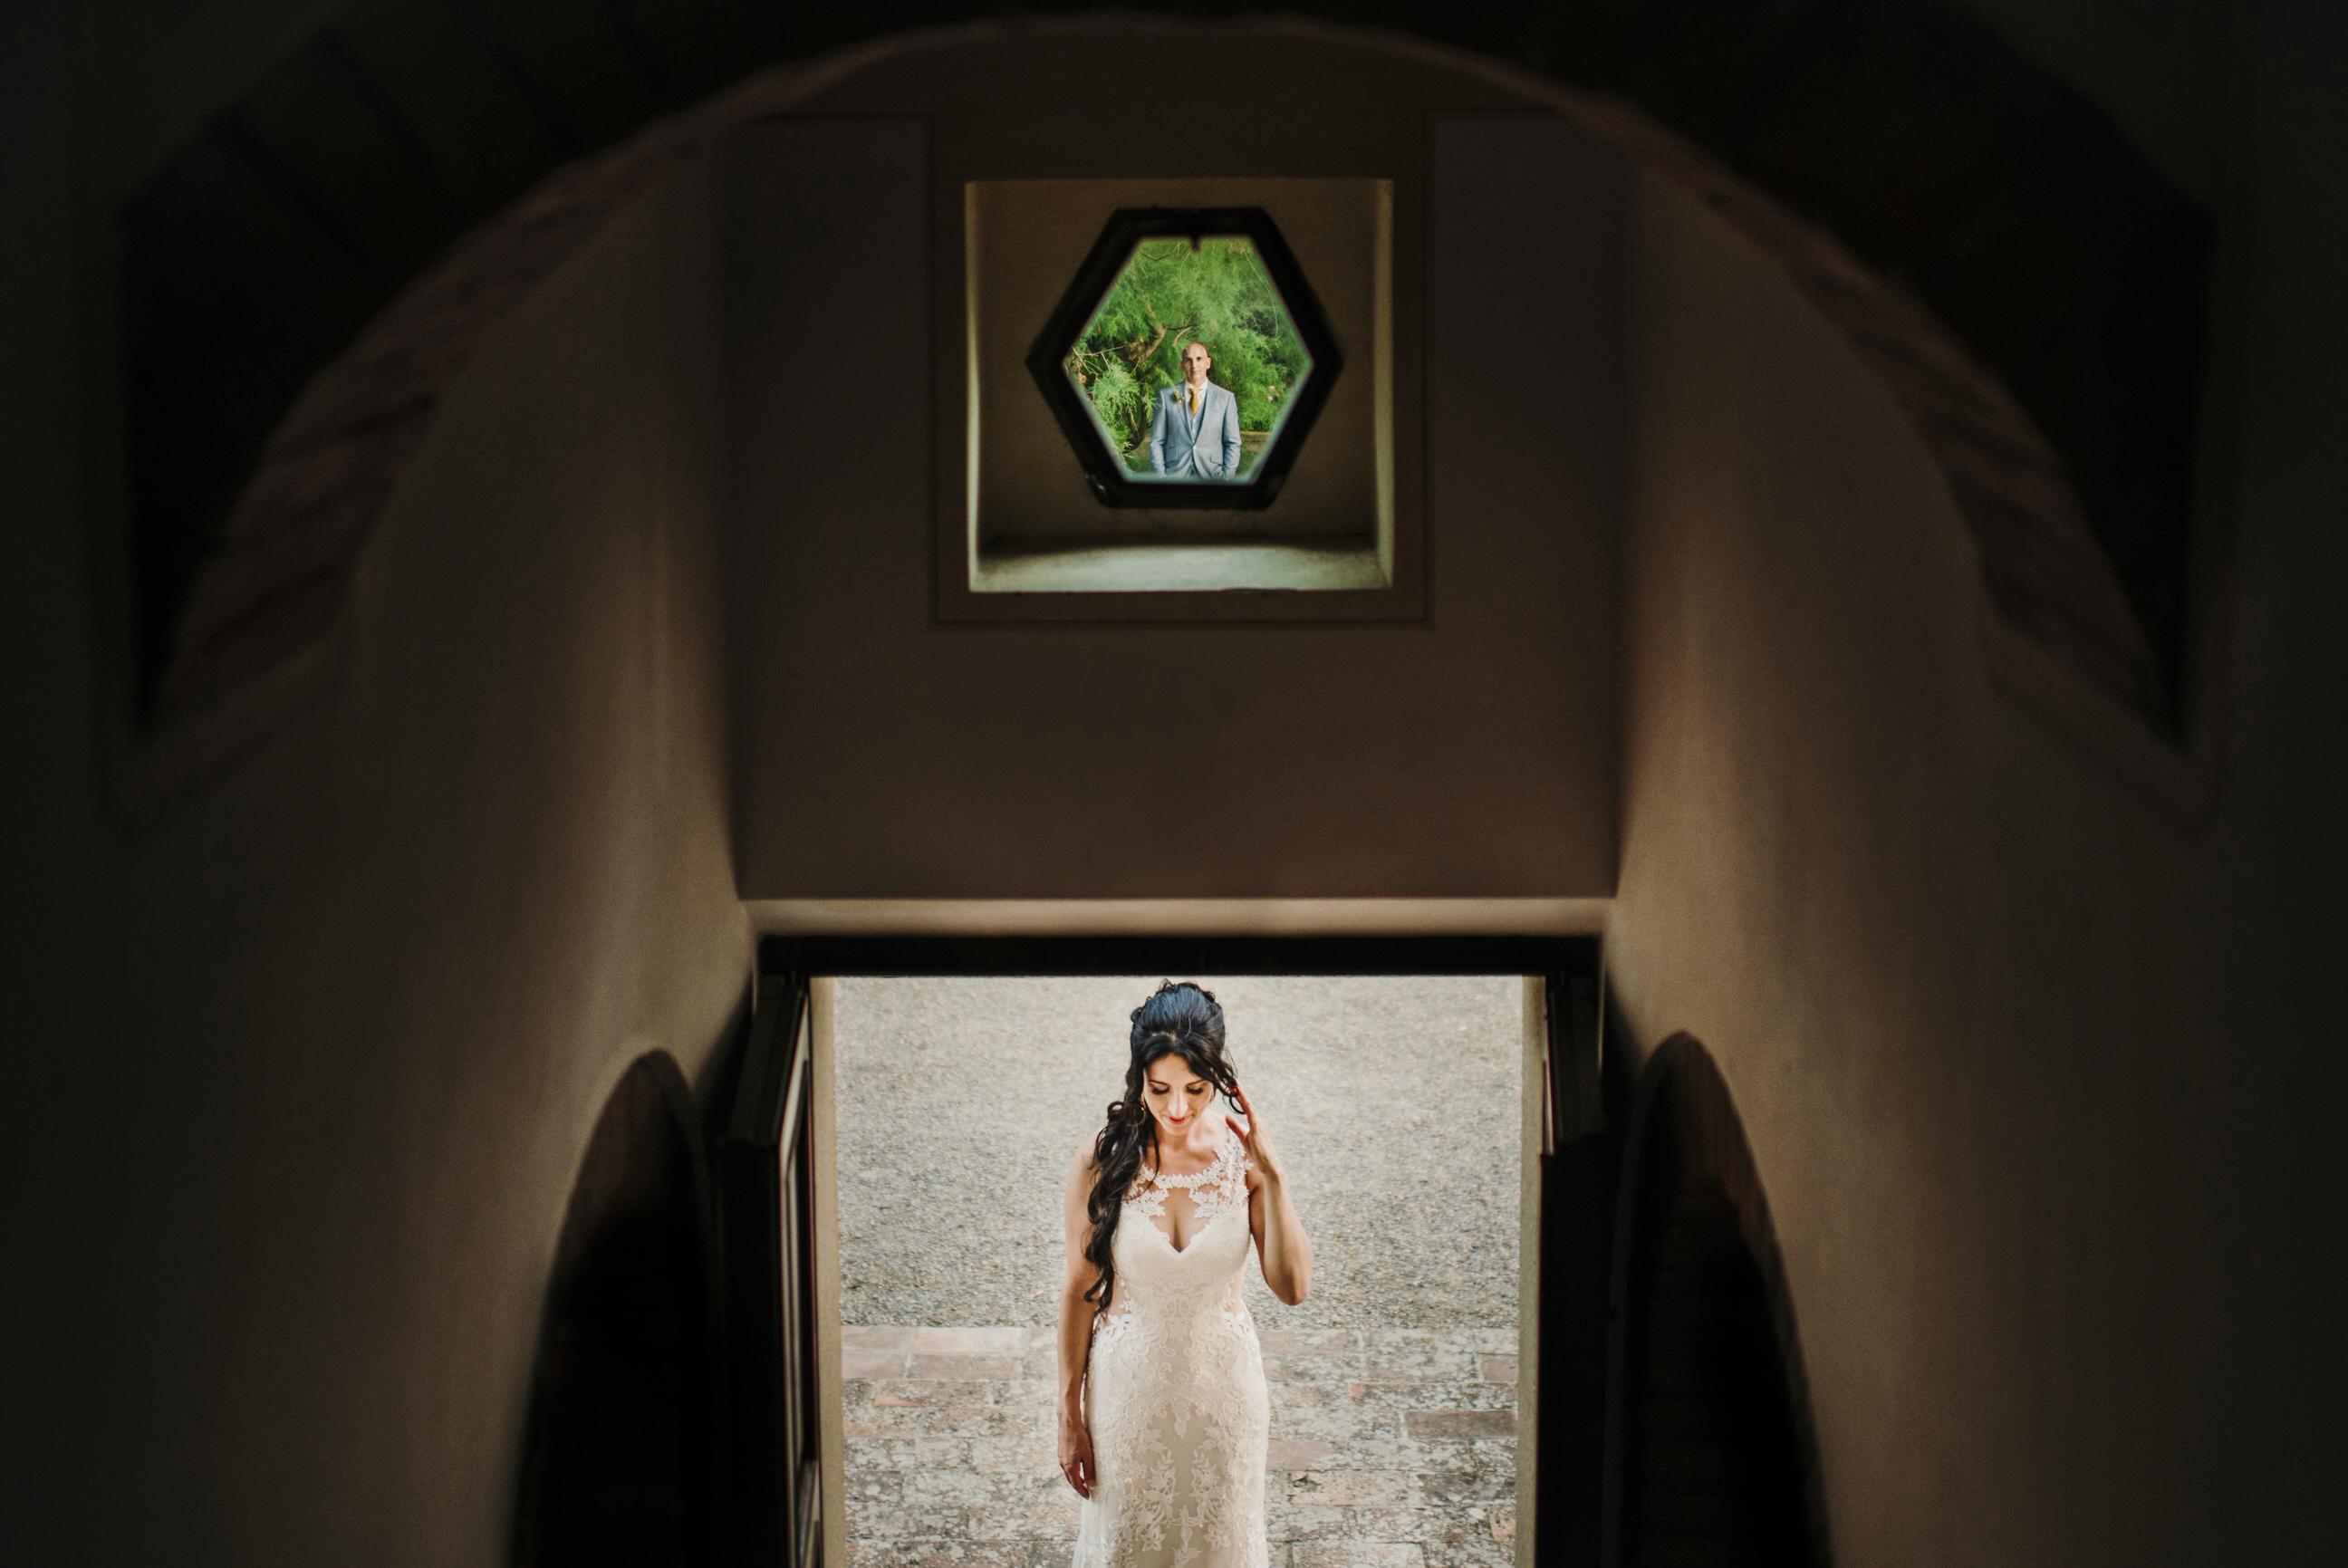 Angela & Micheal - Wedding Villa Podere la Mandriola